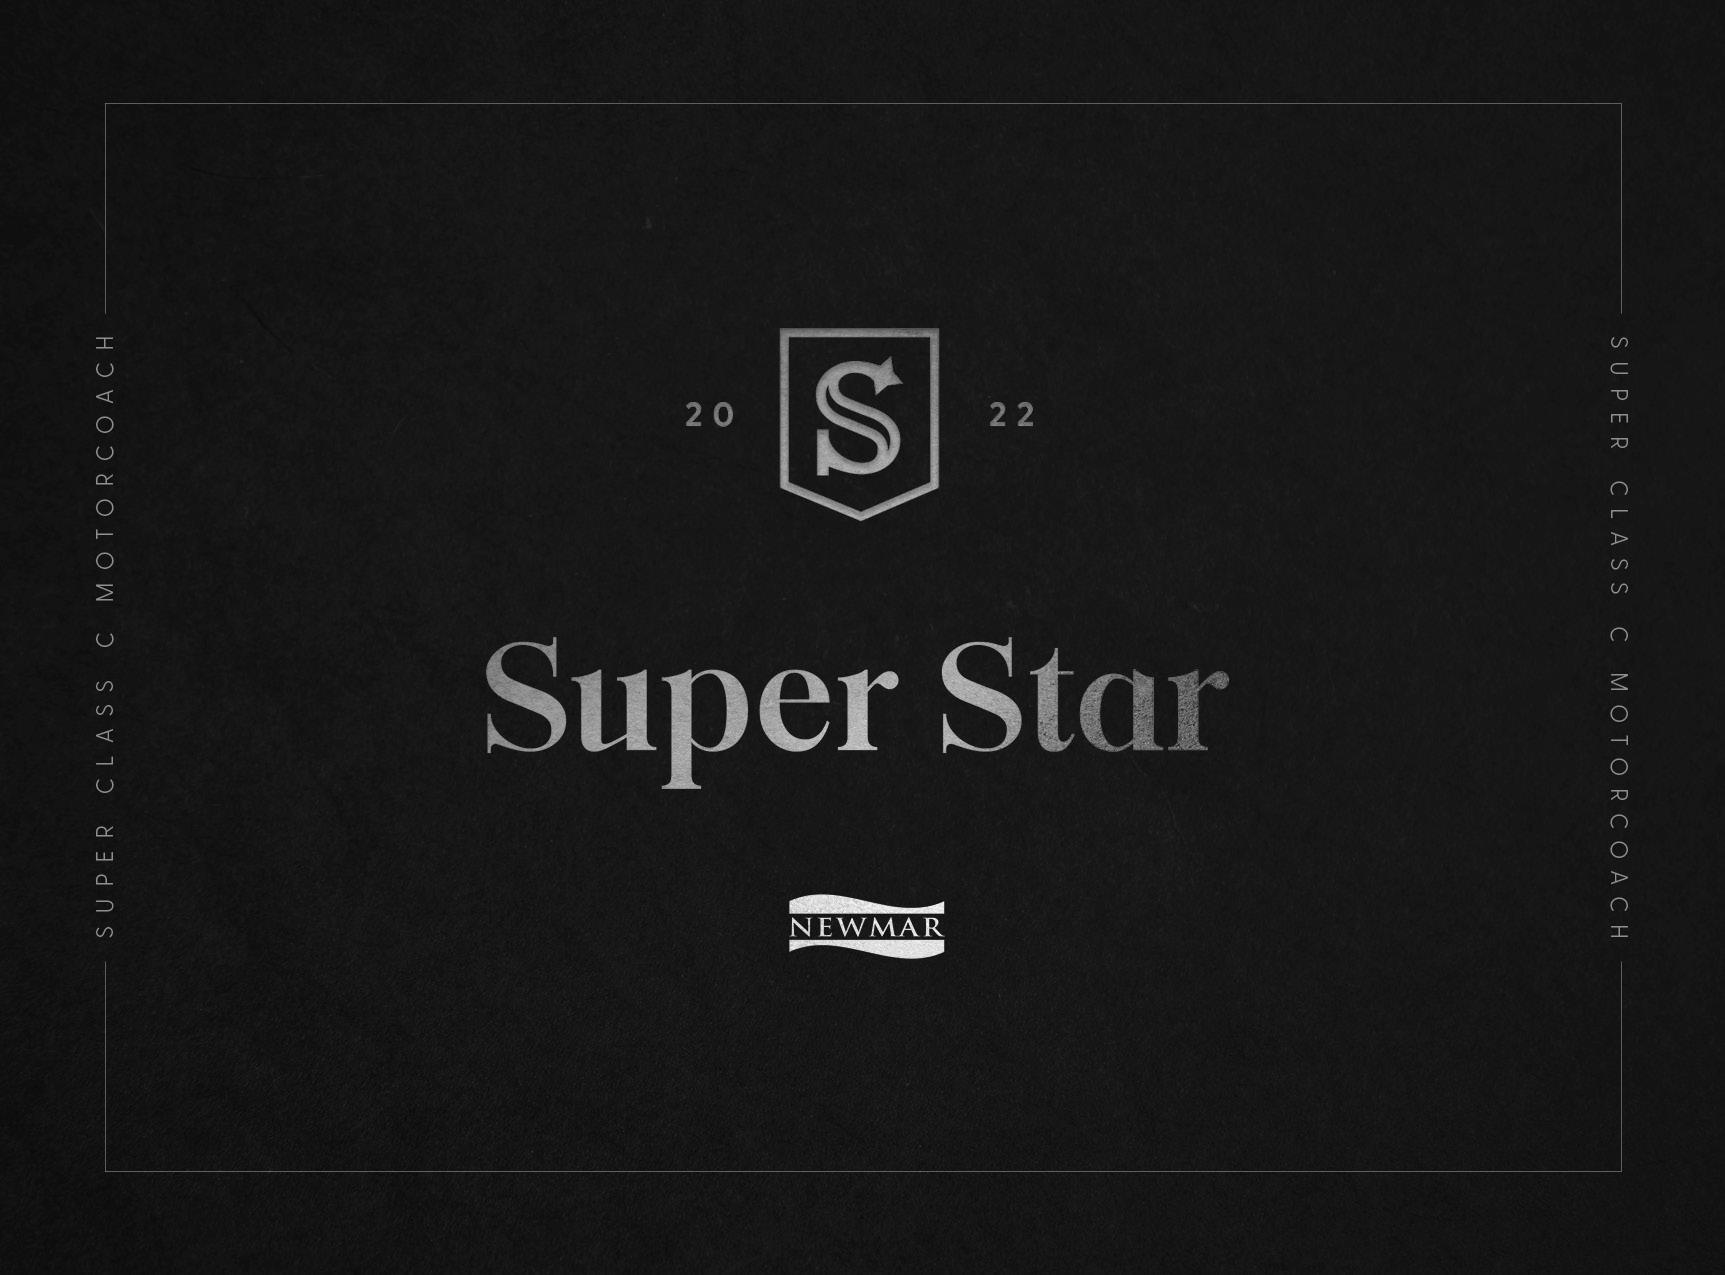 2022 Super Star